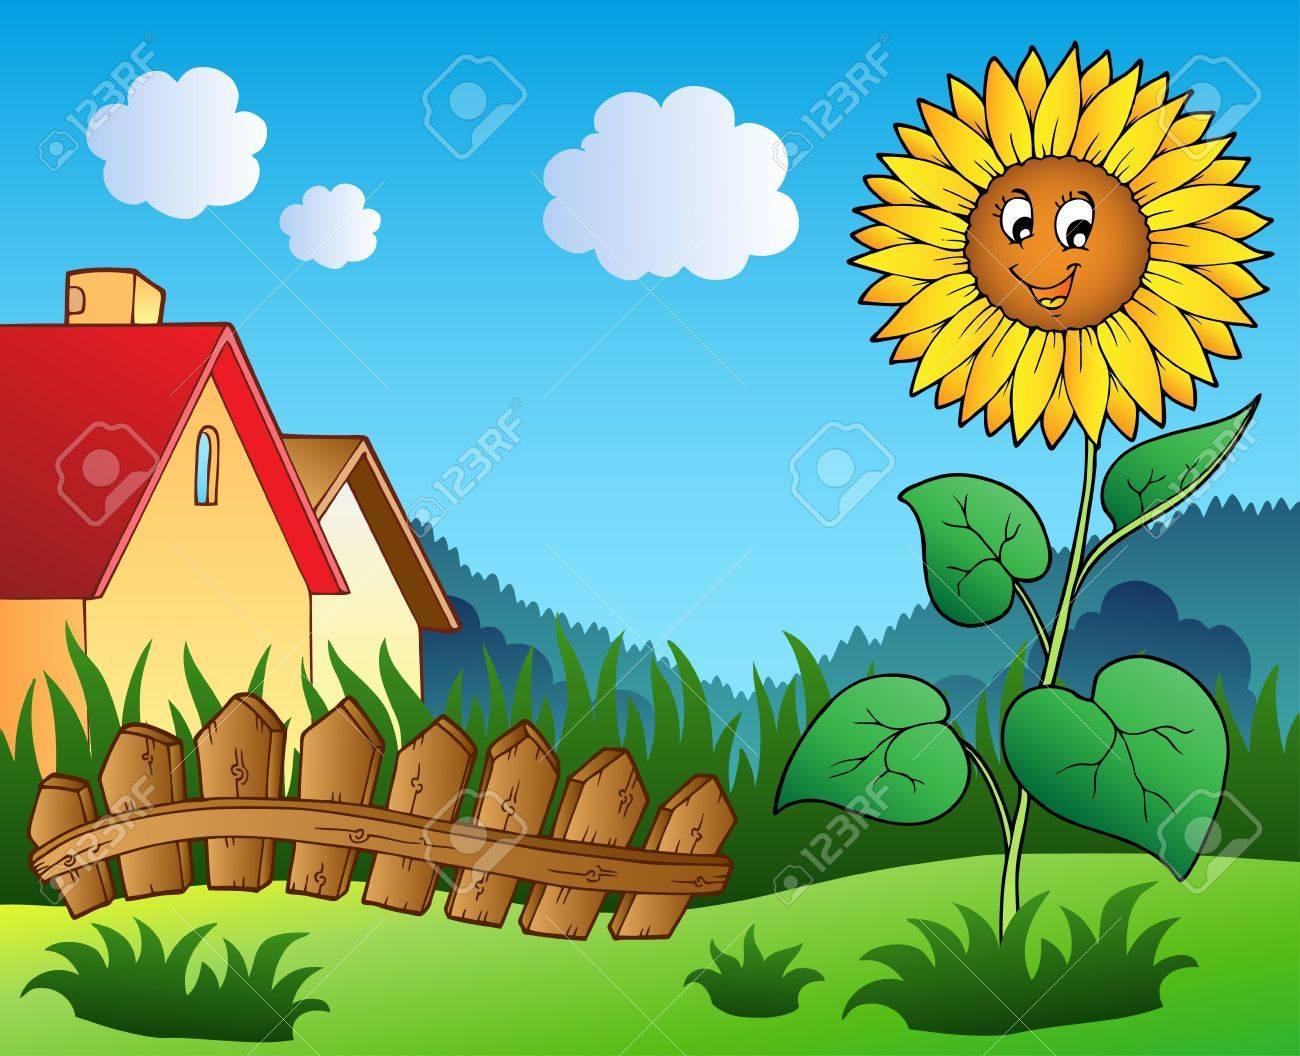 Meadow with cartoon sunflower - vector illustration. Stock Vector - 9674308